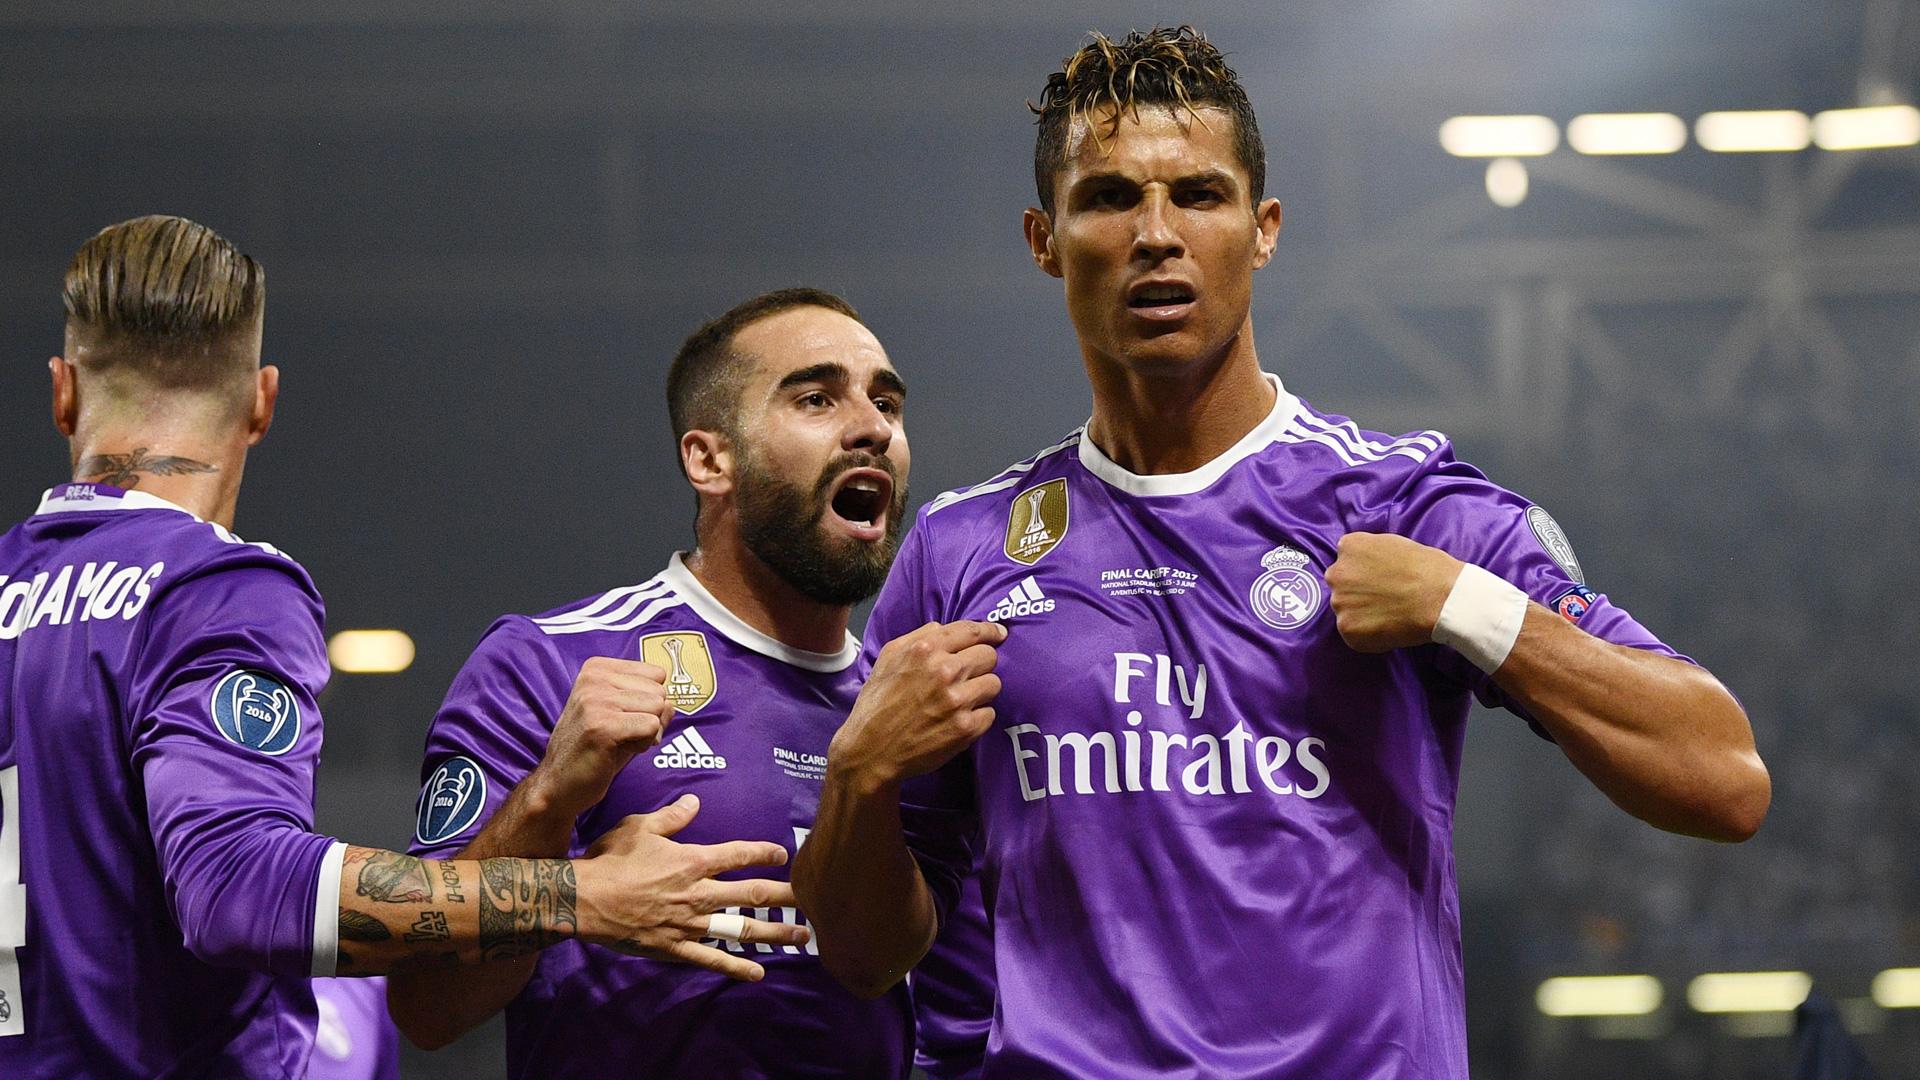 Real Madrid gana su duodédicma Liga de Campeones